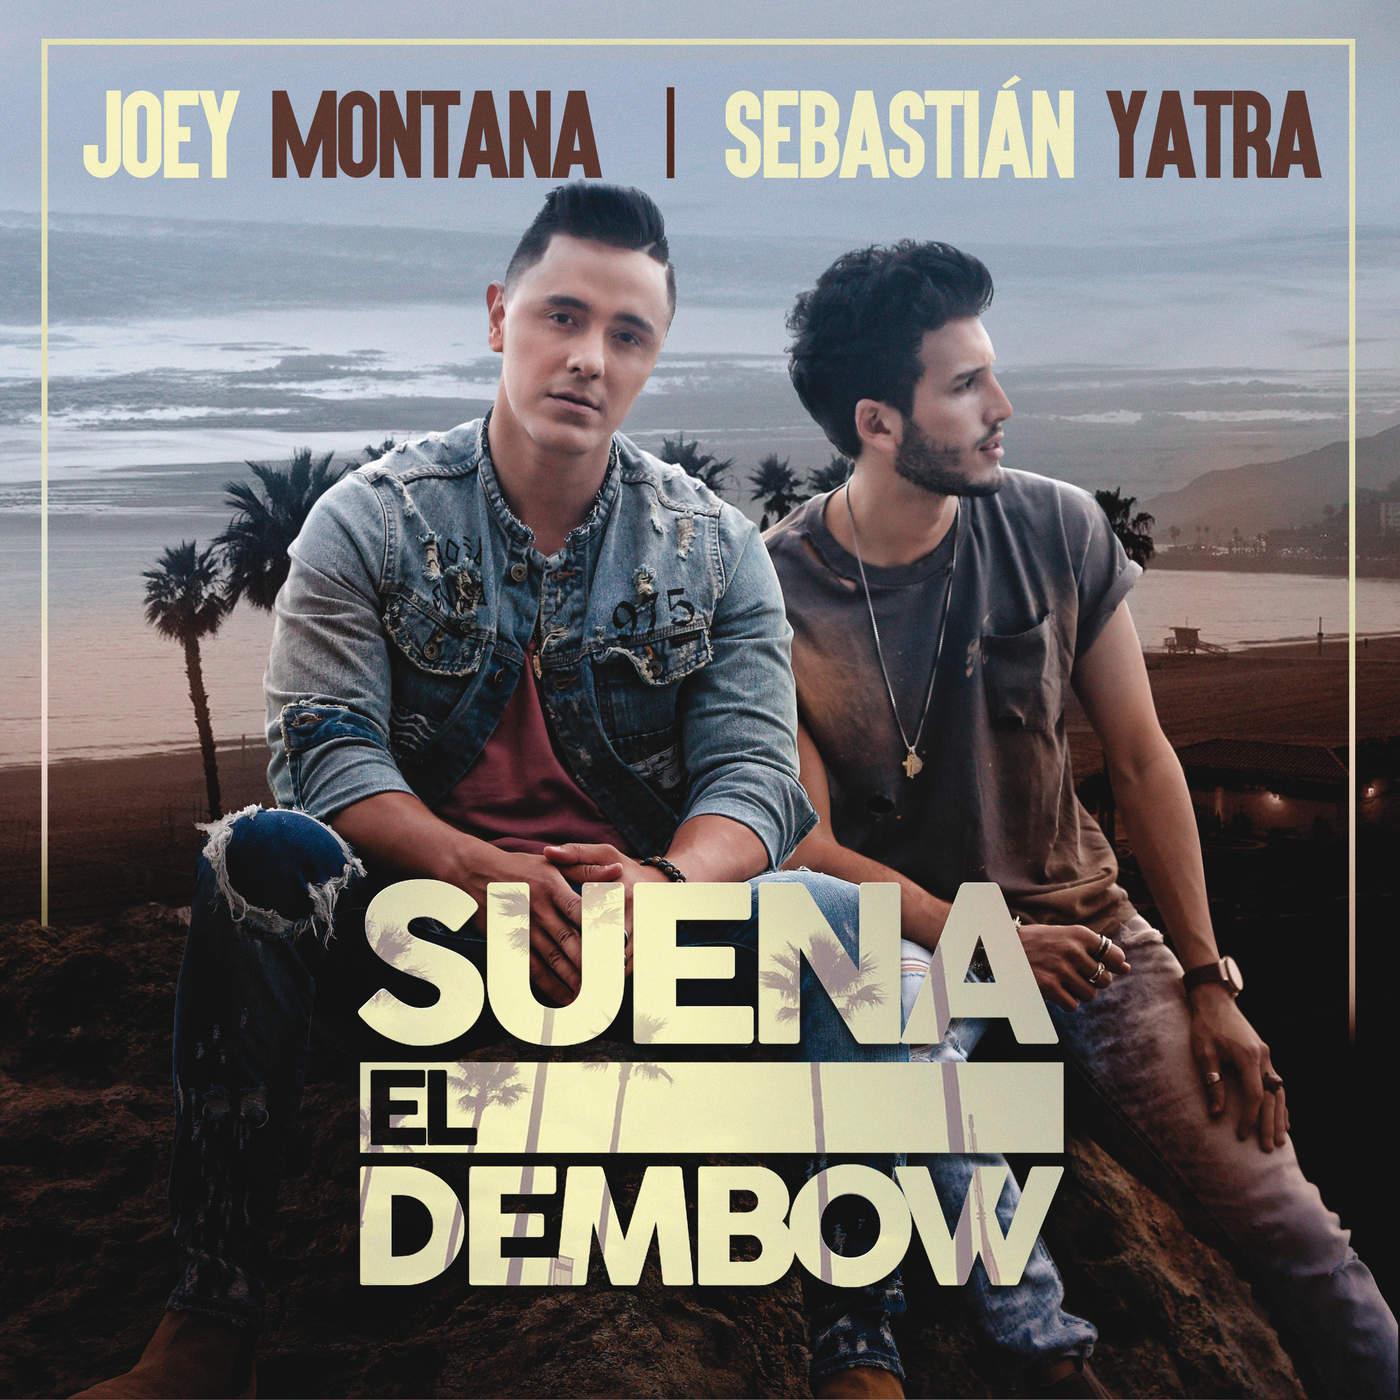 Joey Montana & Sebastian Yatra - Suena El Dembow - Single